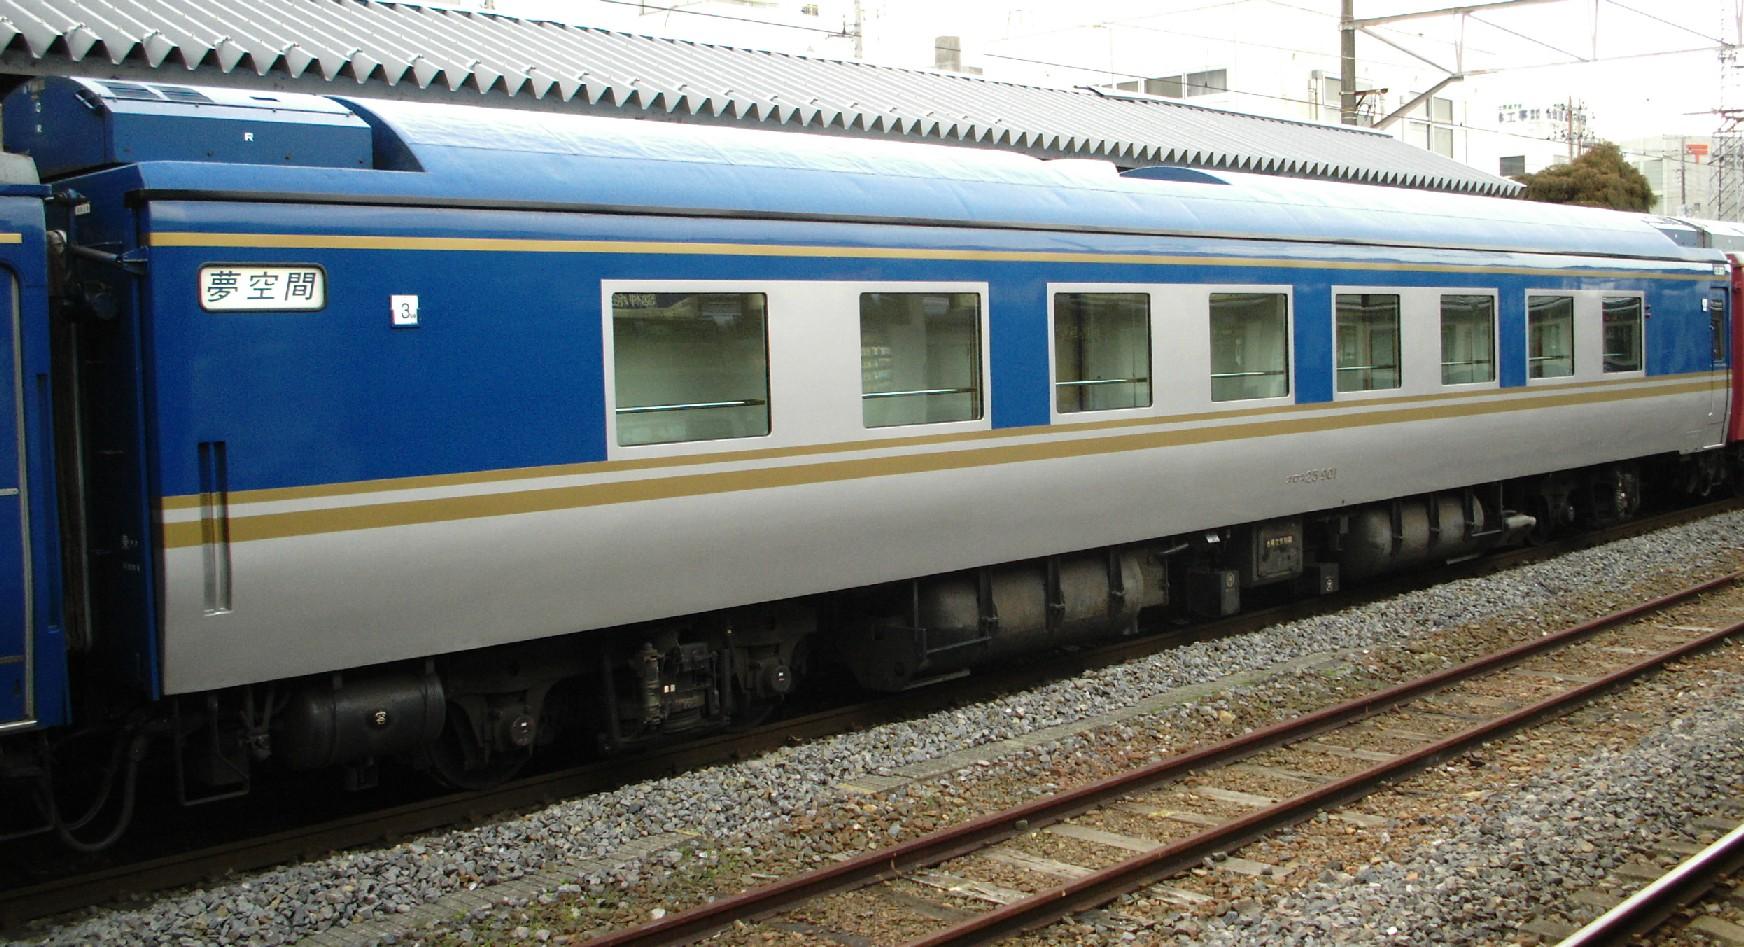 https://upload.wikimedia.org/wikipedia/commons/3/34/Yume_Kukan_ORoNe_25_901_Ishioka_20070309.JPG